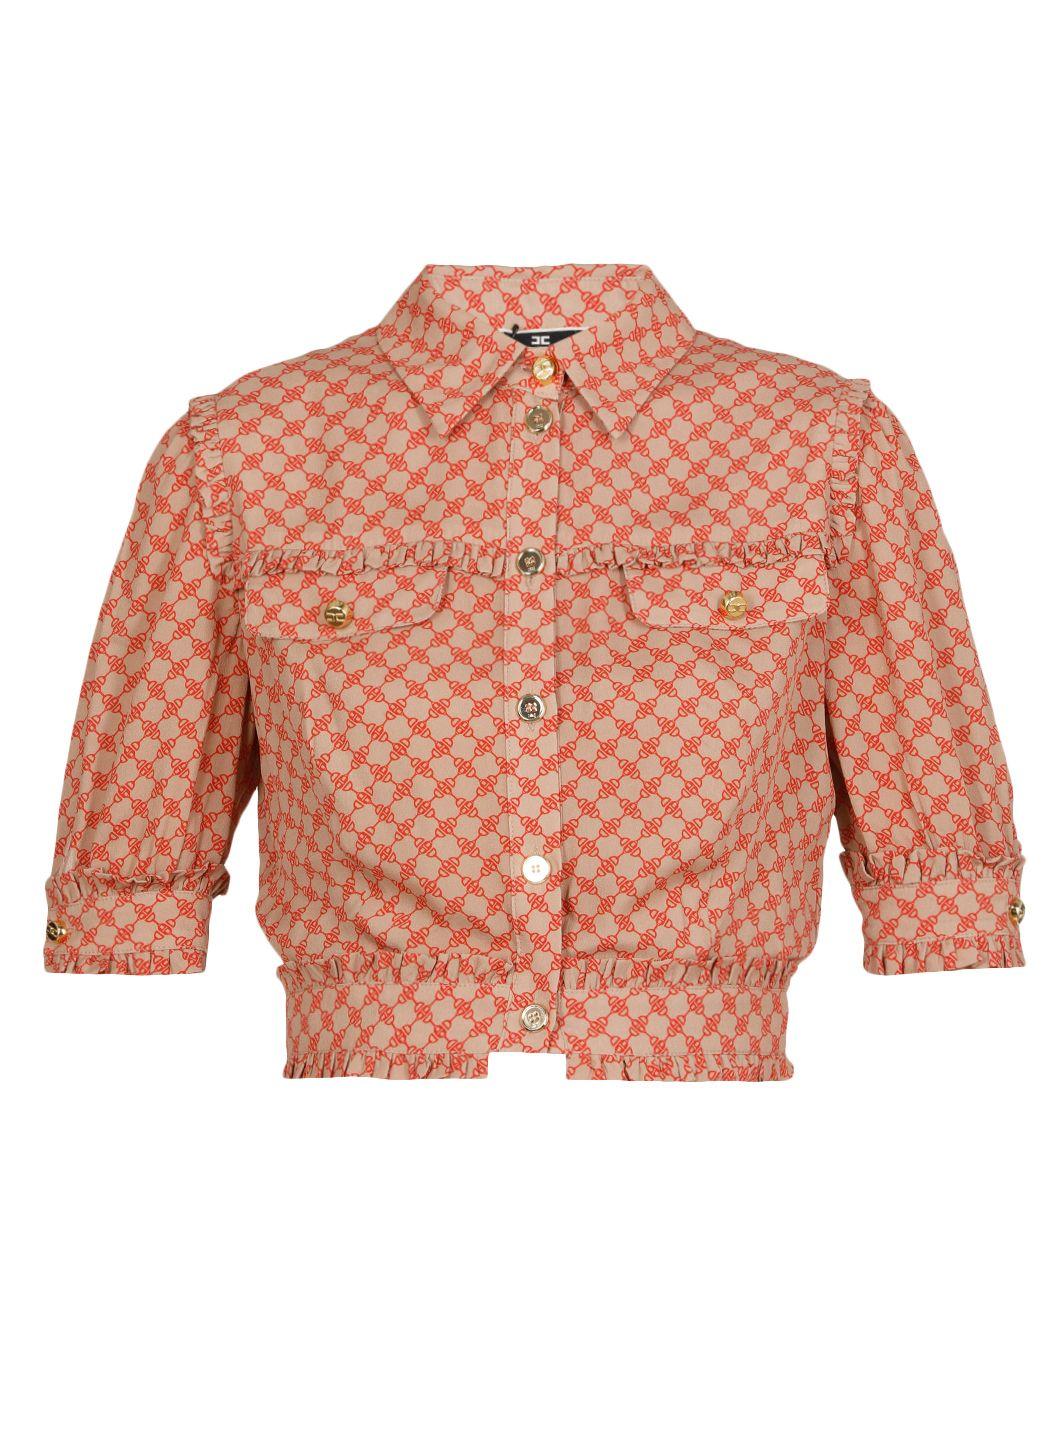 Viscose georgette cropped shirt